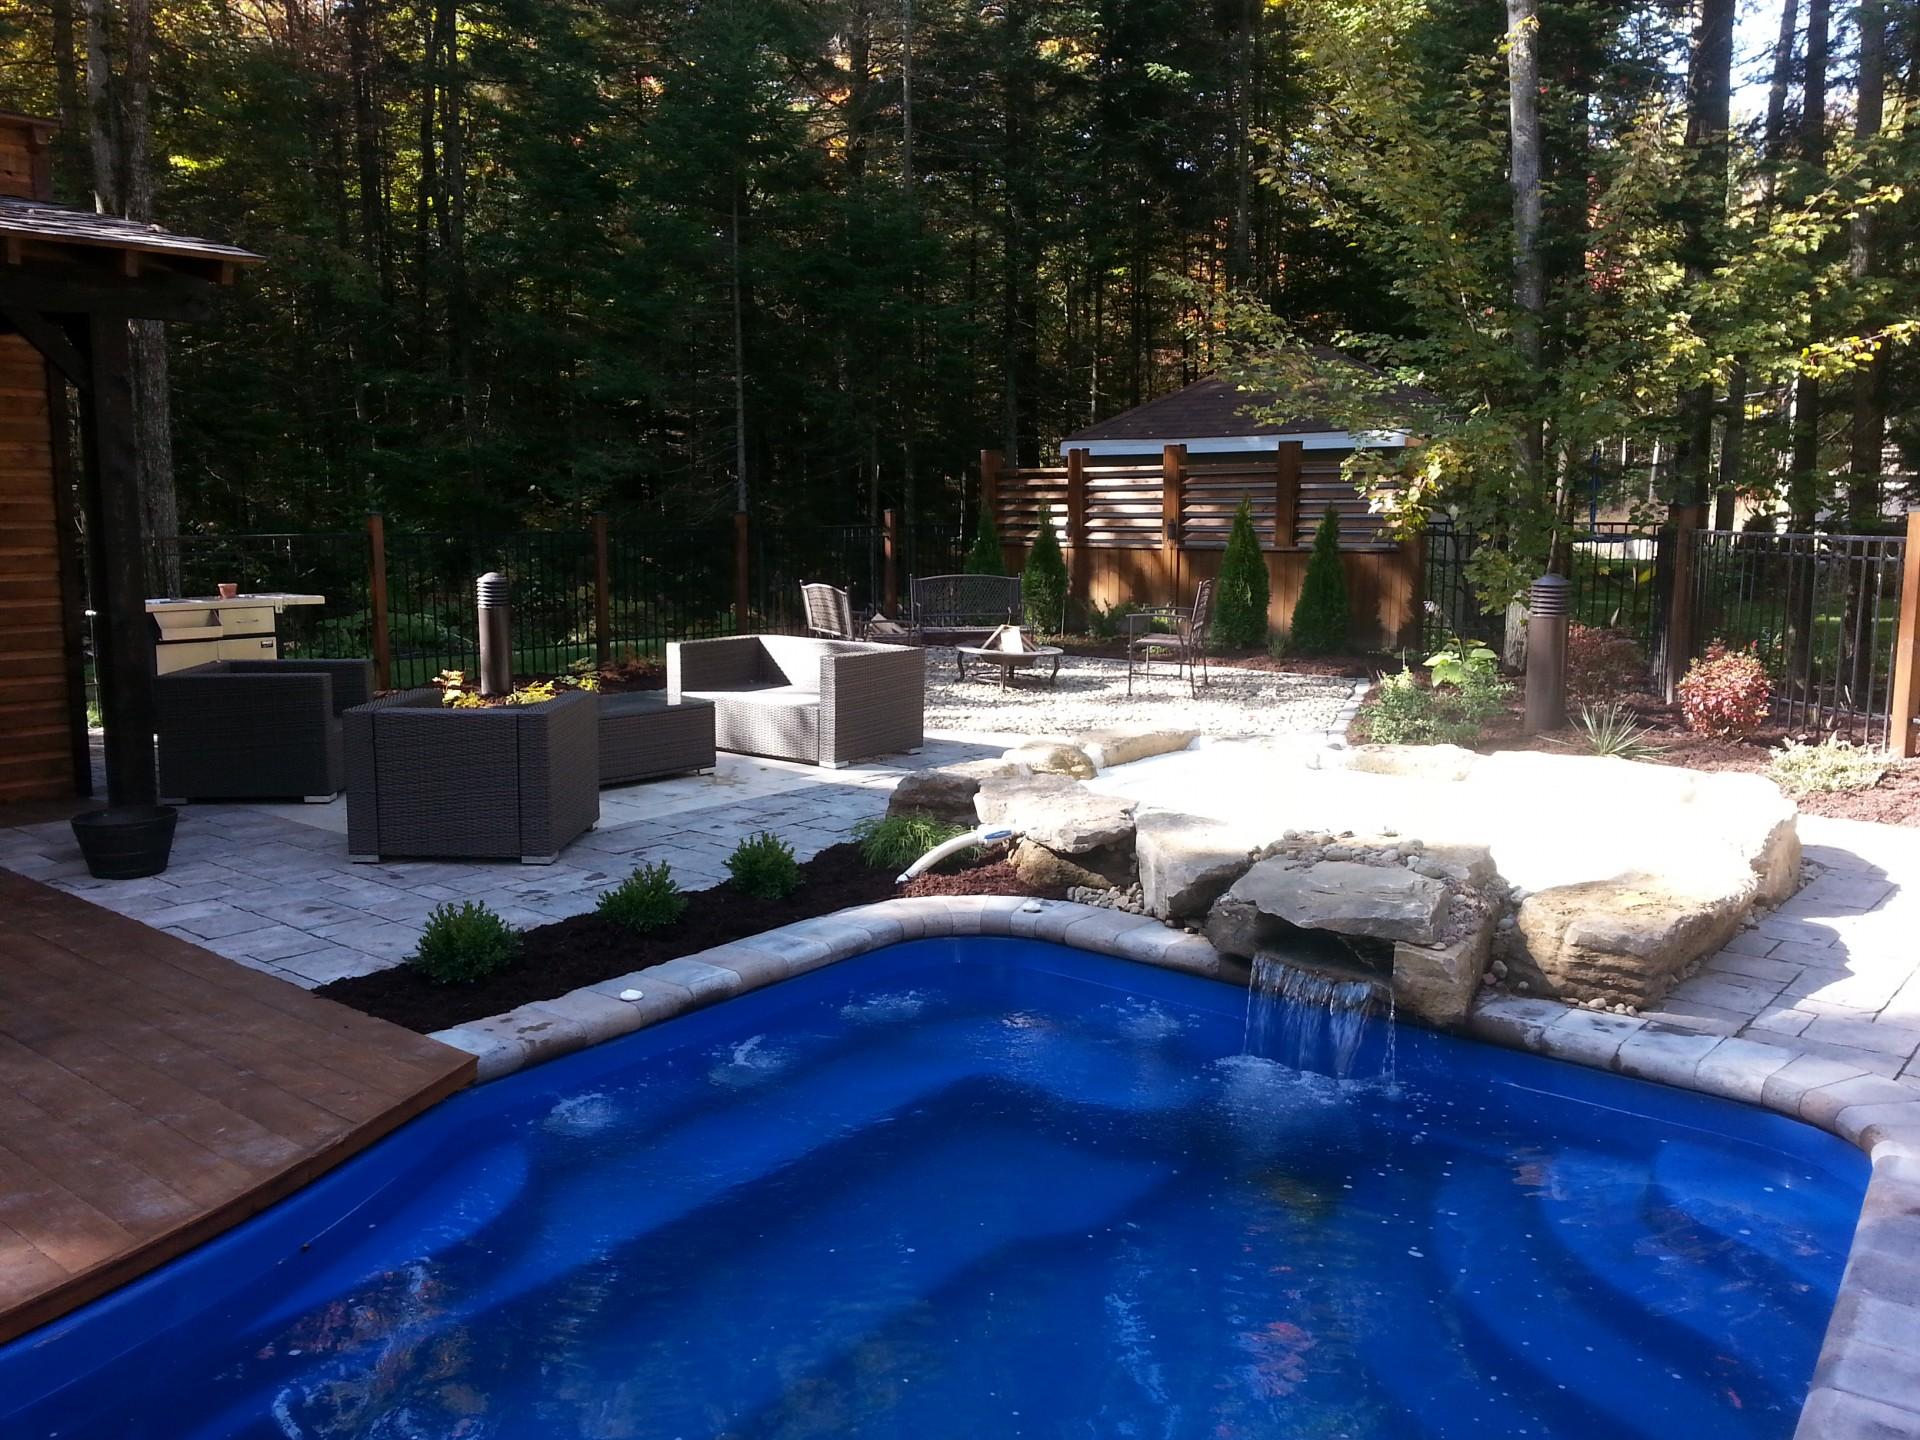 Piscine En Fibre De Verre A Vendre installation de piscine et spa